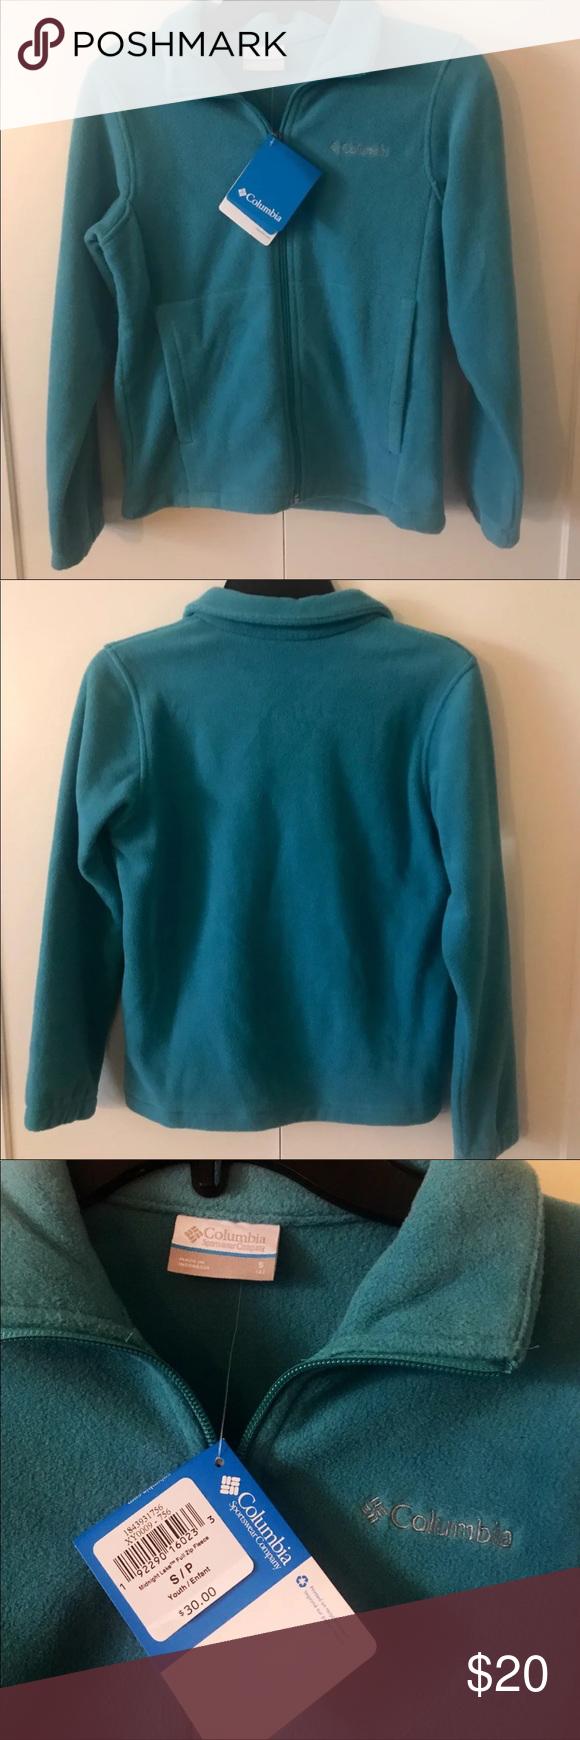 Columbia Kids Fleece Sweater Brand New Columbia fleece sweater for girls in size…